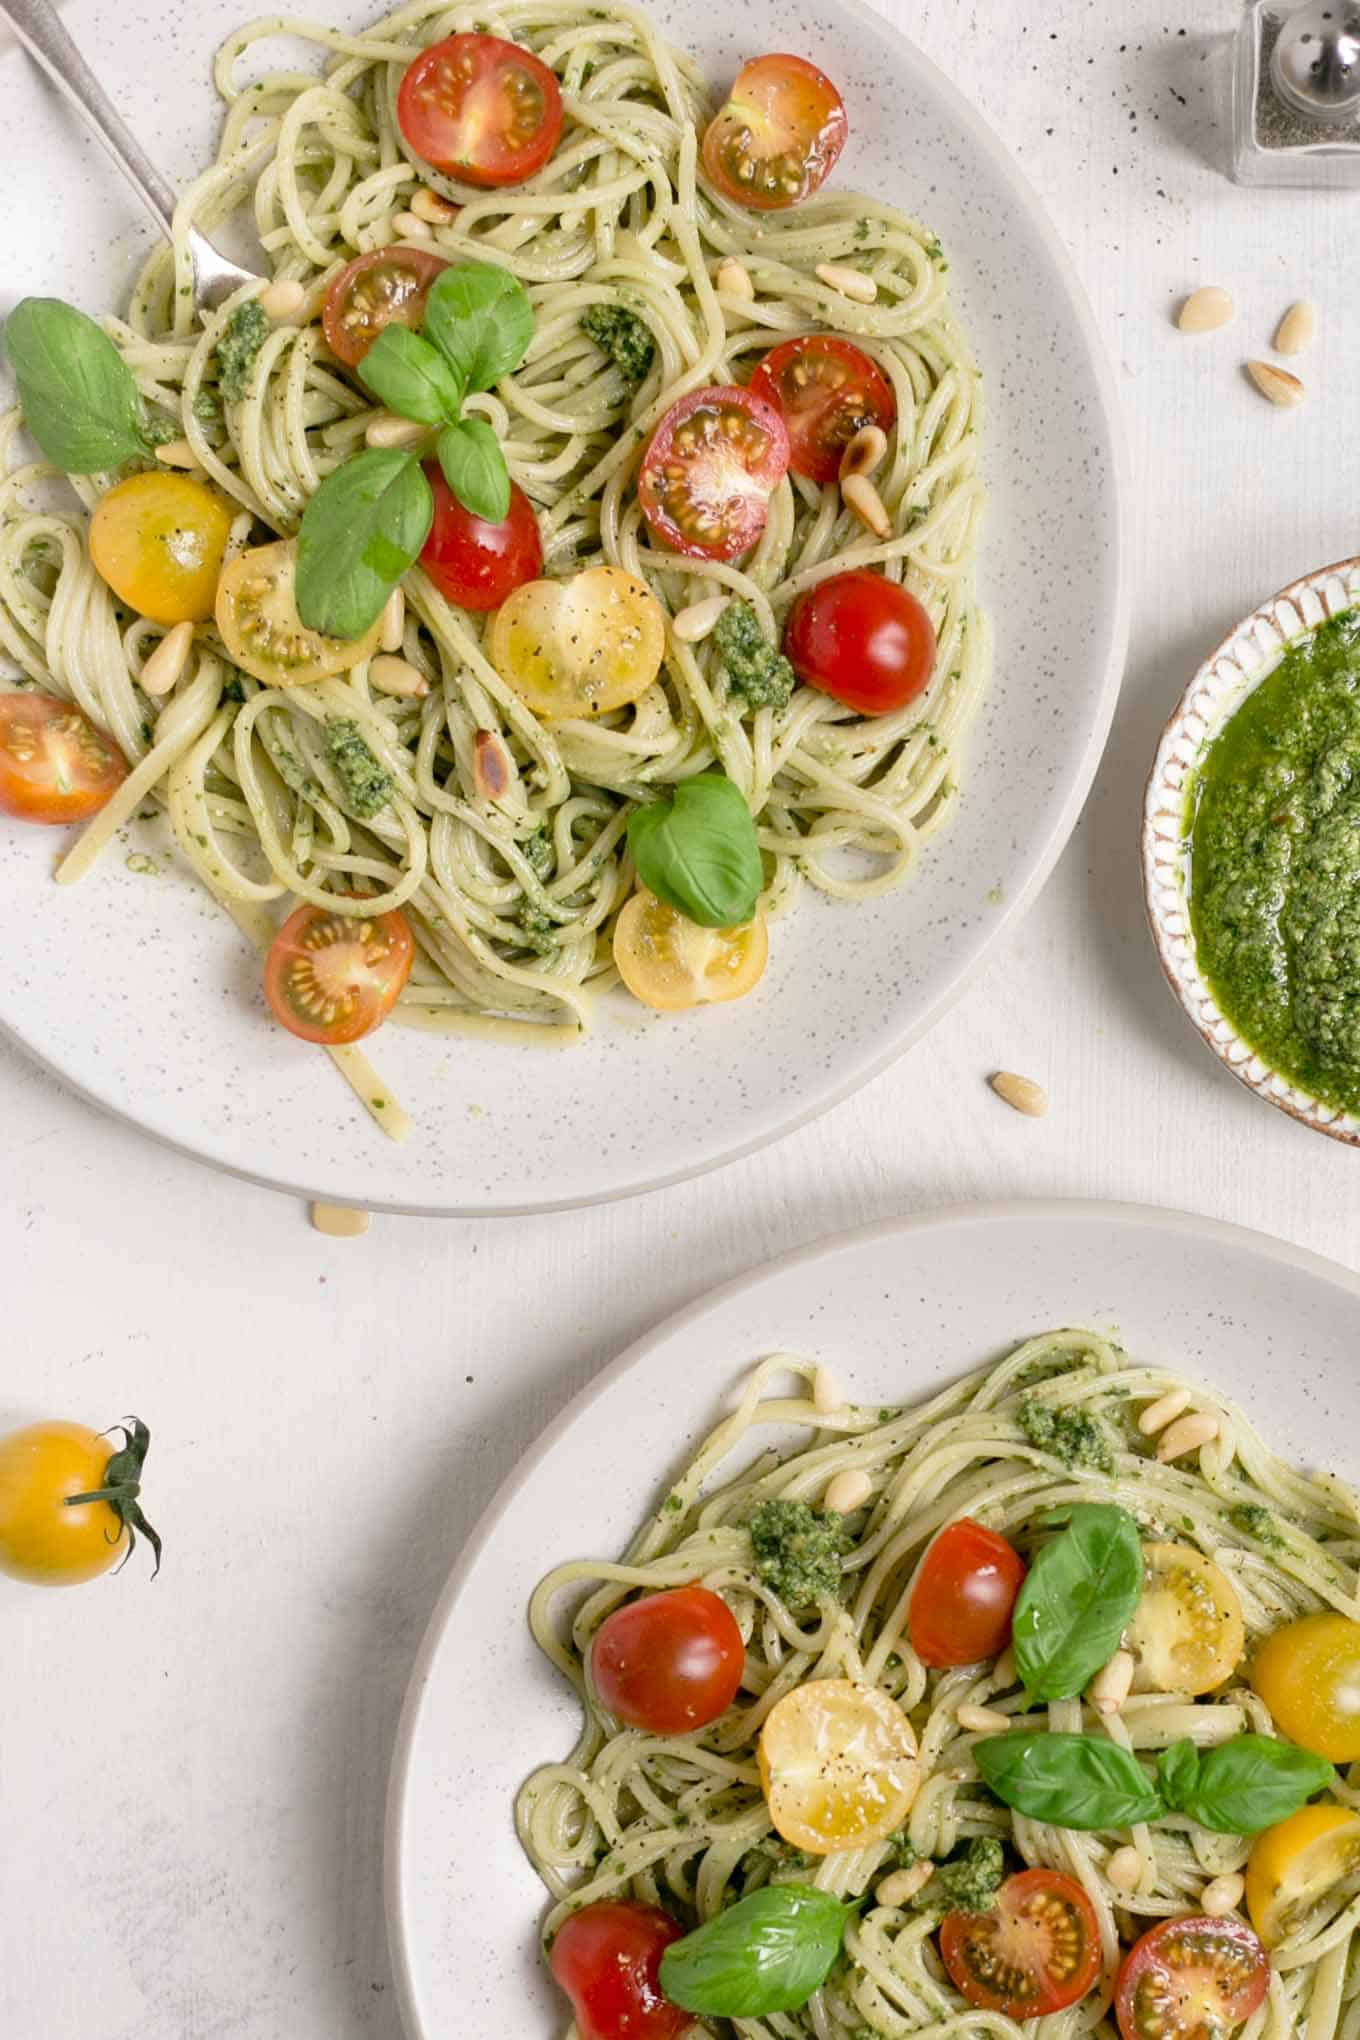 Pesto pasta with juicy cherry tomatoes! Ready in 15 minutes! #veganrecipe #dairyfree #healthyrecipe | via @annabanana.co